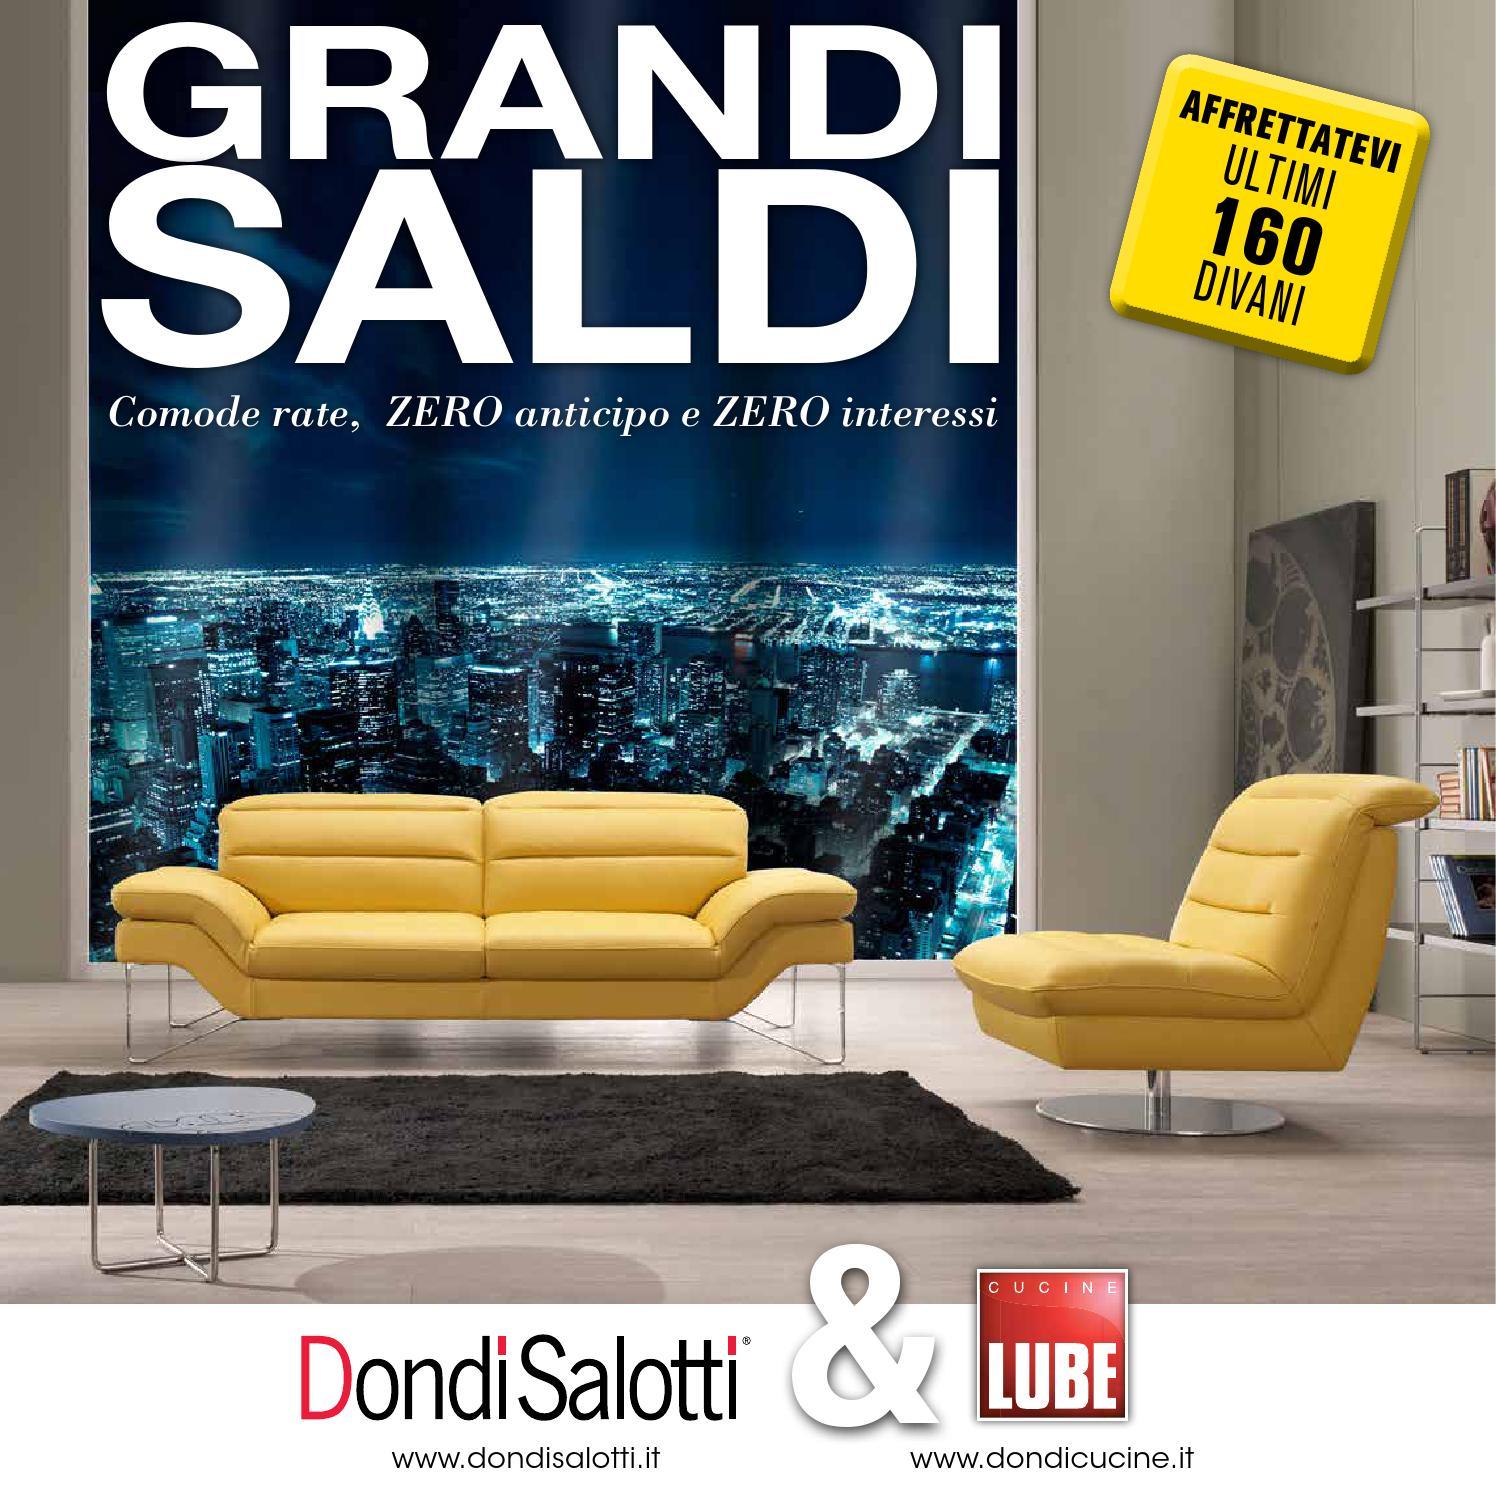 Emejing Dondi Salotti Divani Pictures - Brentwoodseasidecabins.com ...